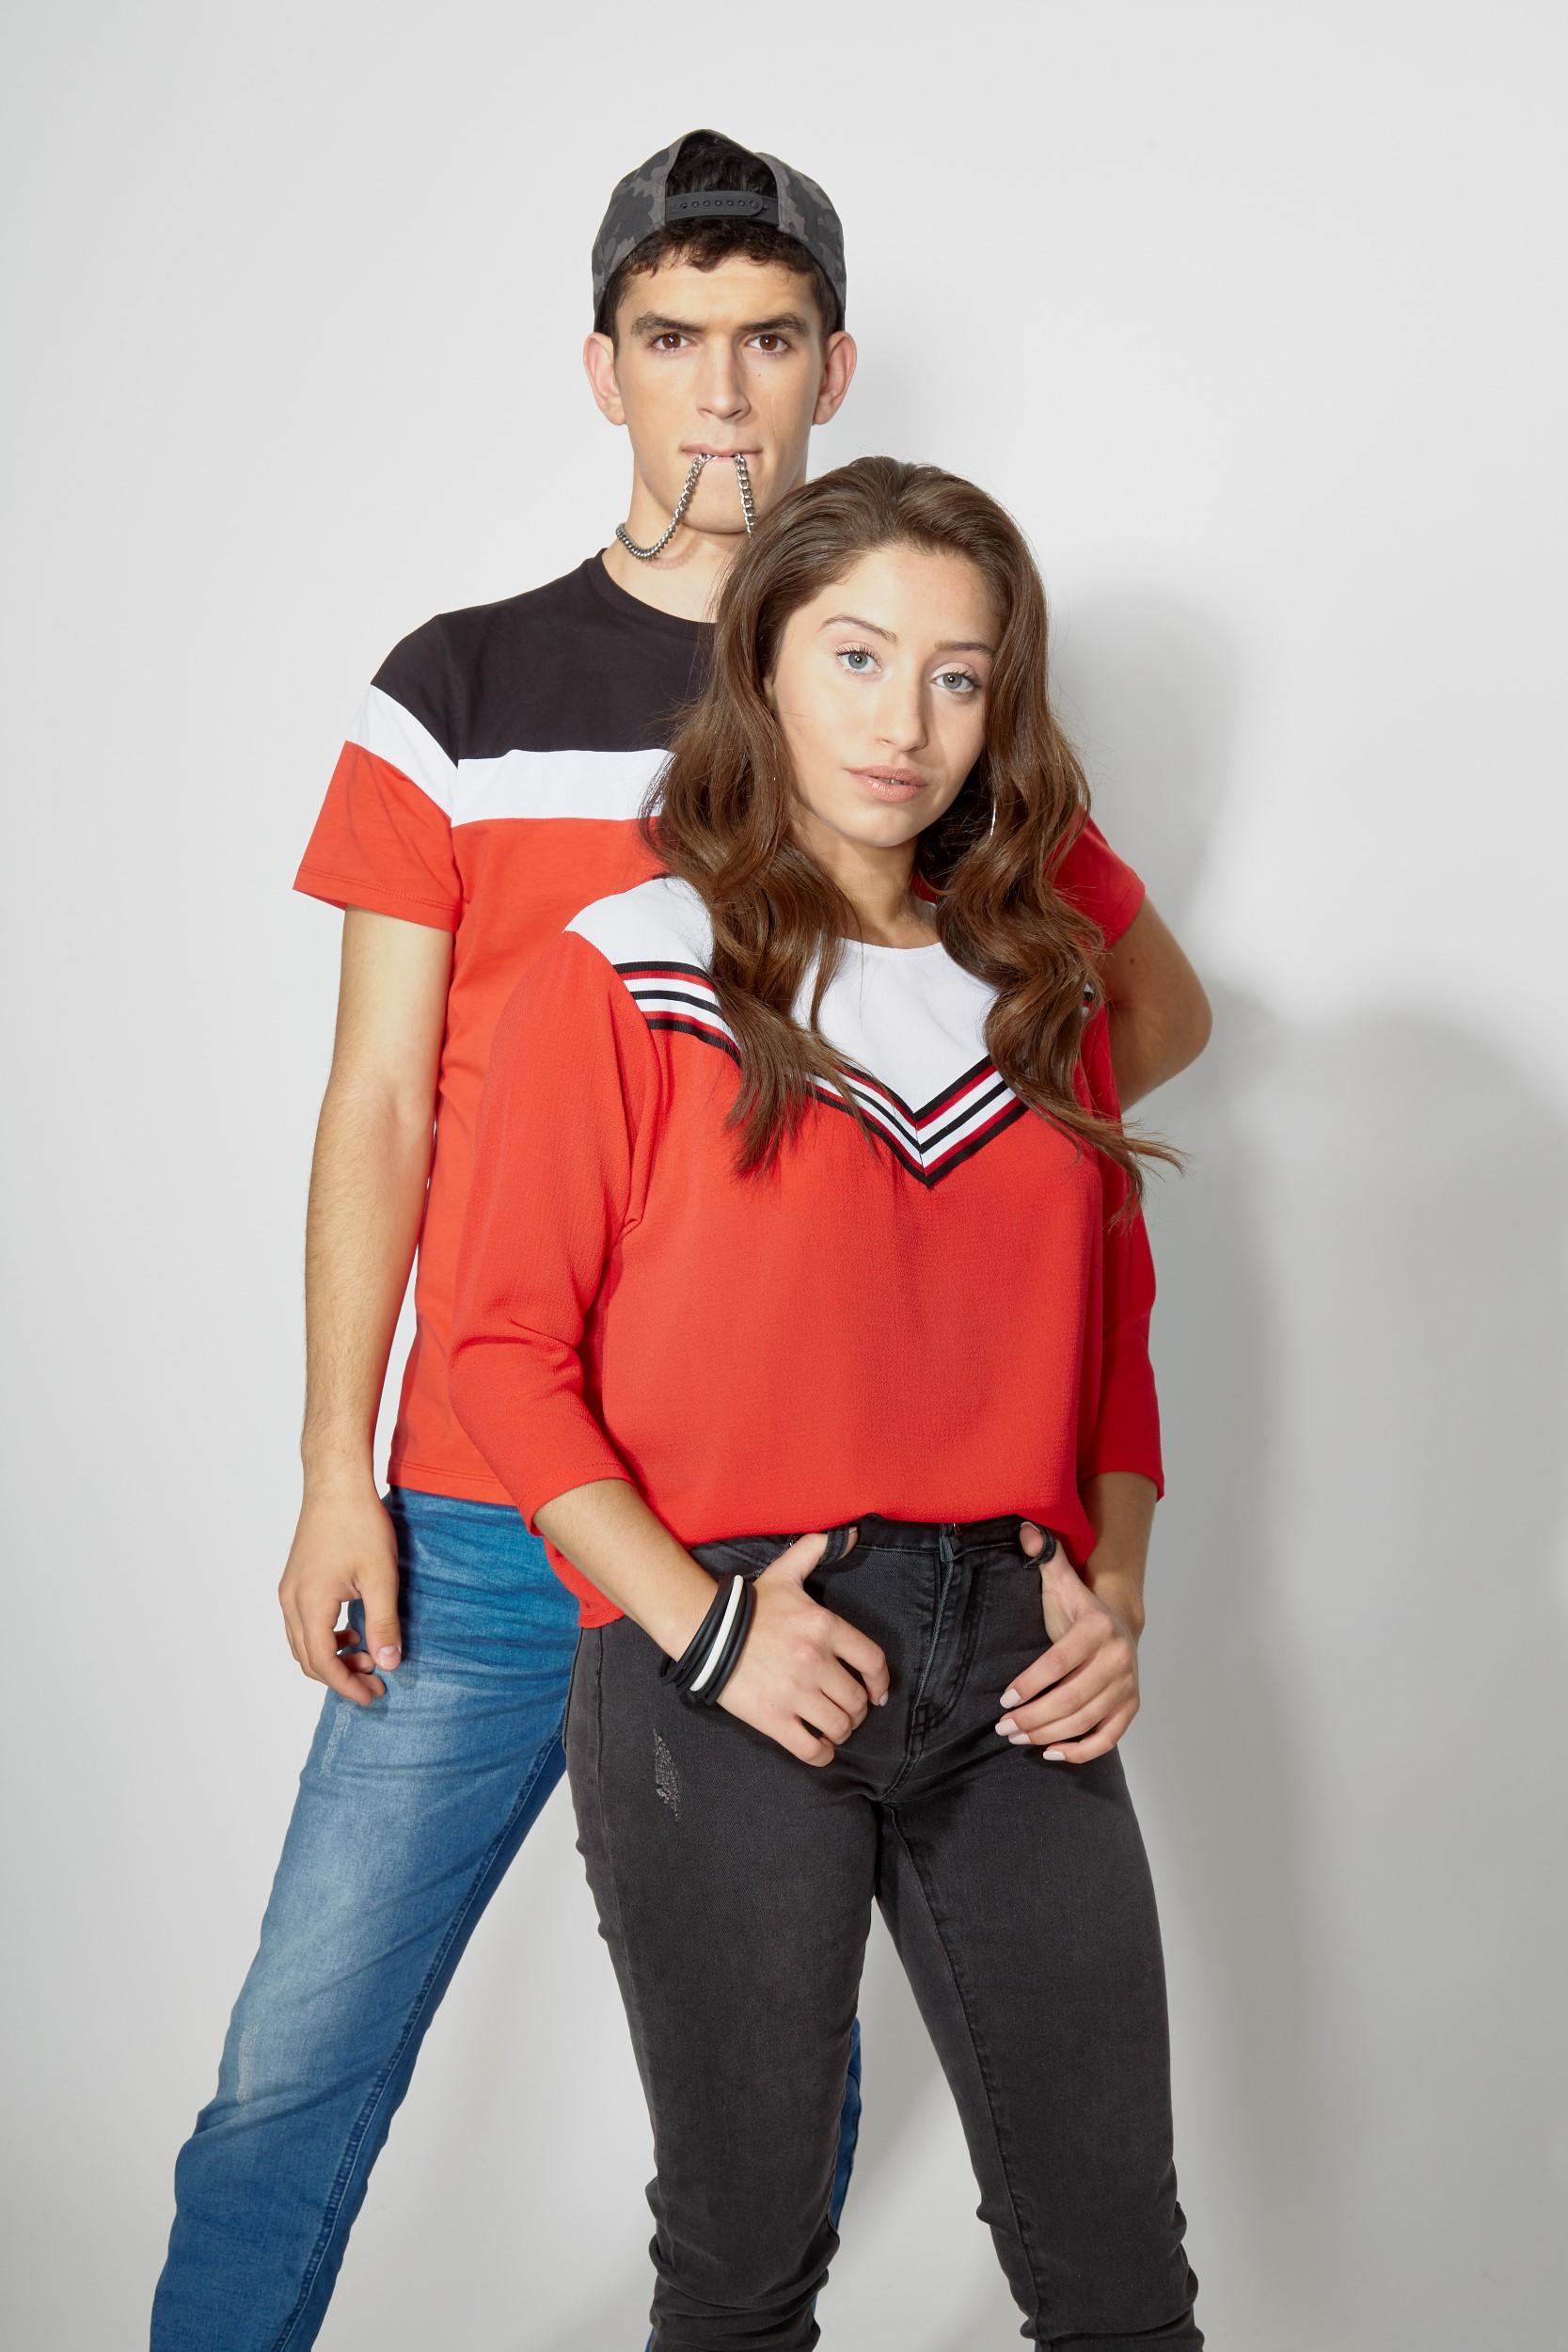 TNT- קולקציית חורף- חולצת נערות 109.90 שח, ג'ינס נערות 169.90 שח, חולצה גברים 129.90 שח, ג'ינס גברים 249.90 שח צילום dvision